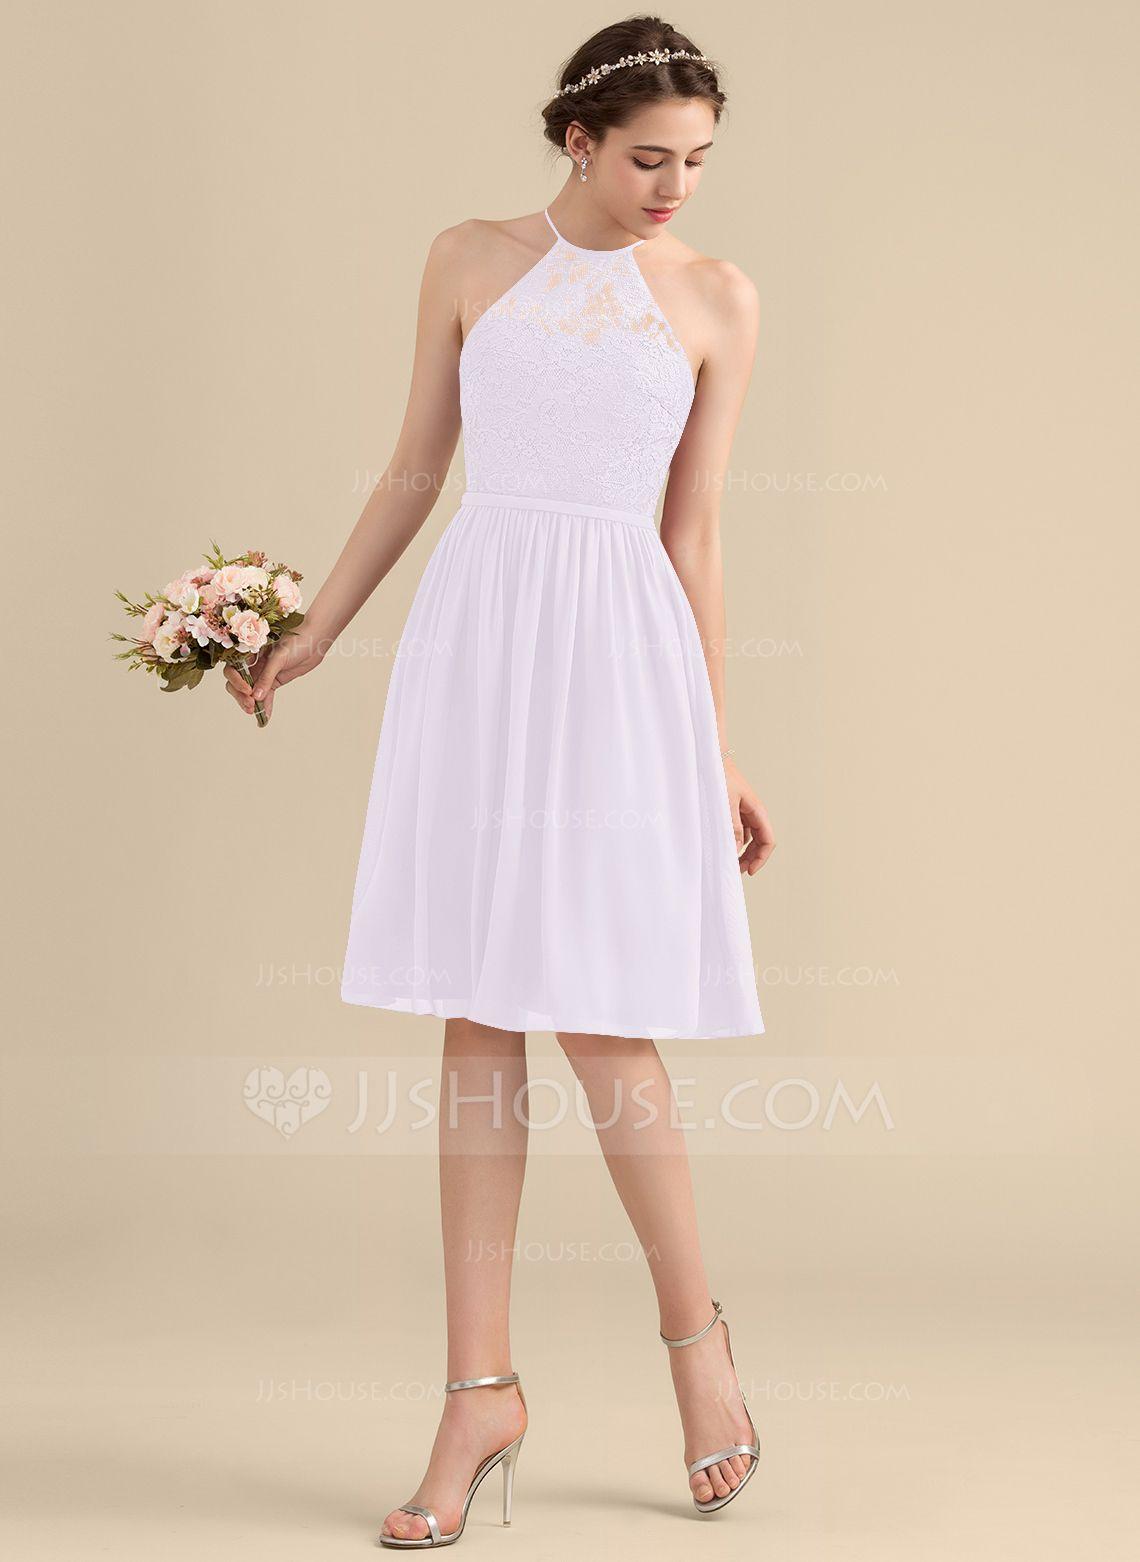 3de3ab057815 A-Line/Princess Scoop Neck Knee-Length Chiffon Lace Bridesmaid Dress  (007153358) - Bridesmaid Dresses - JJsHouse